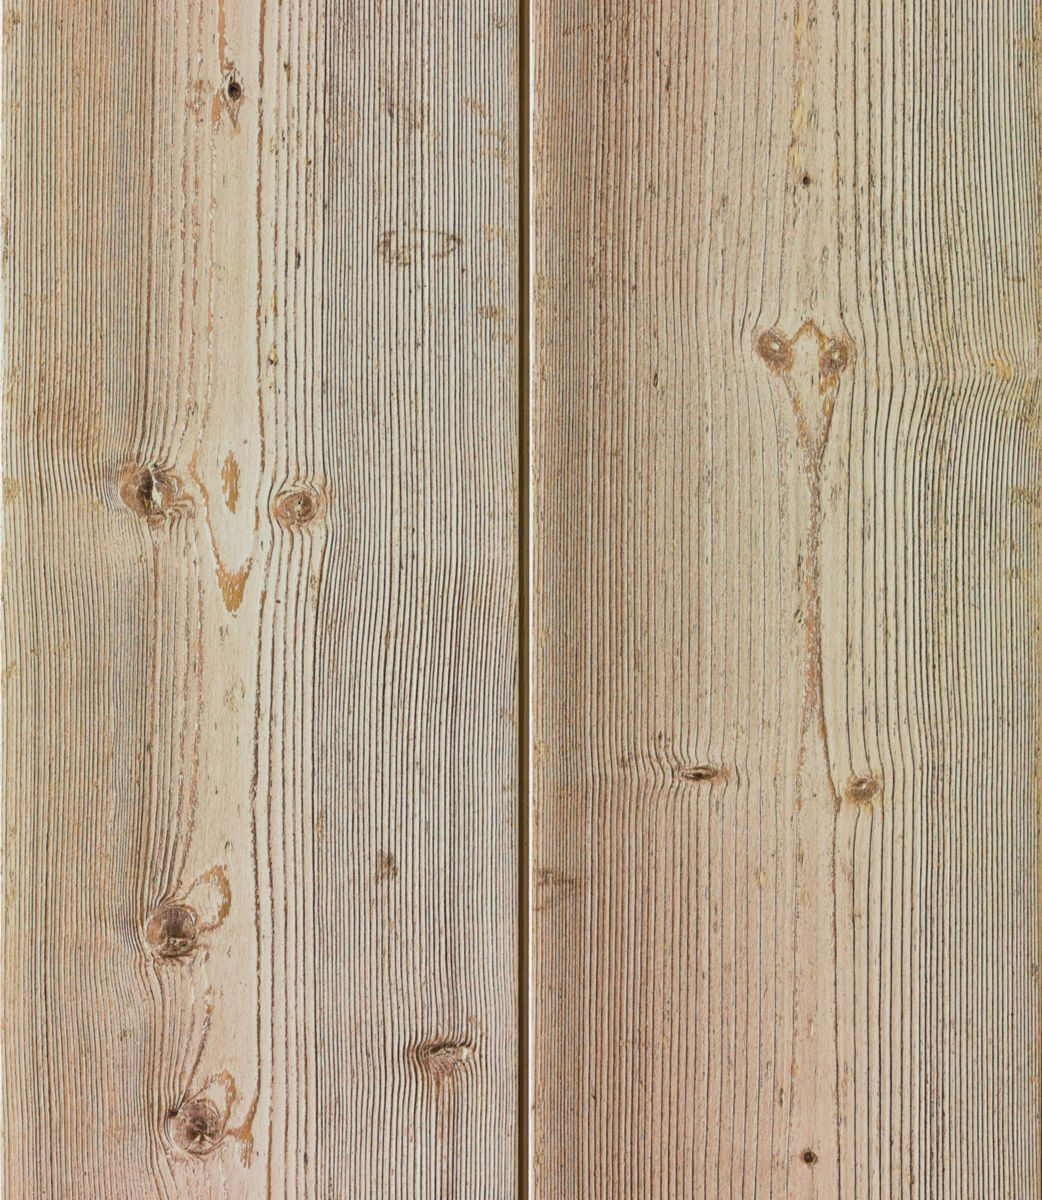 verniland lambris sapin du nord bross br l yaki profil. Black Bedroom Furniture Sets. Home Design Ideas